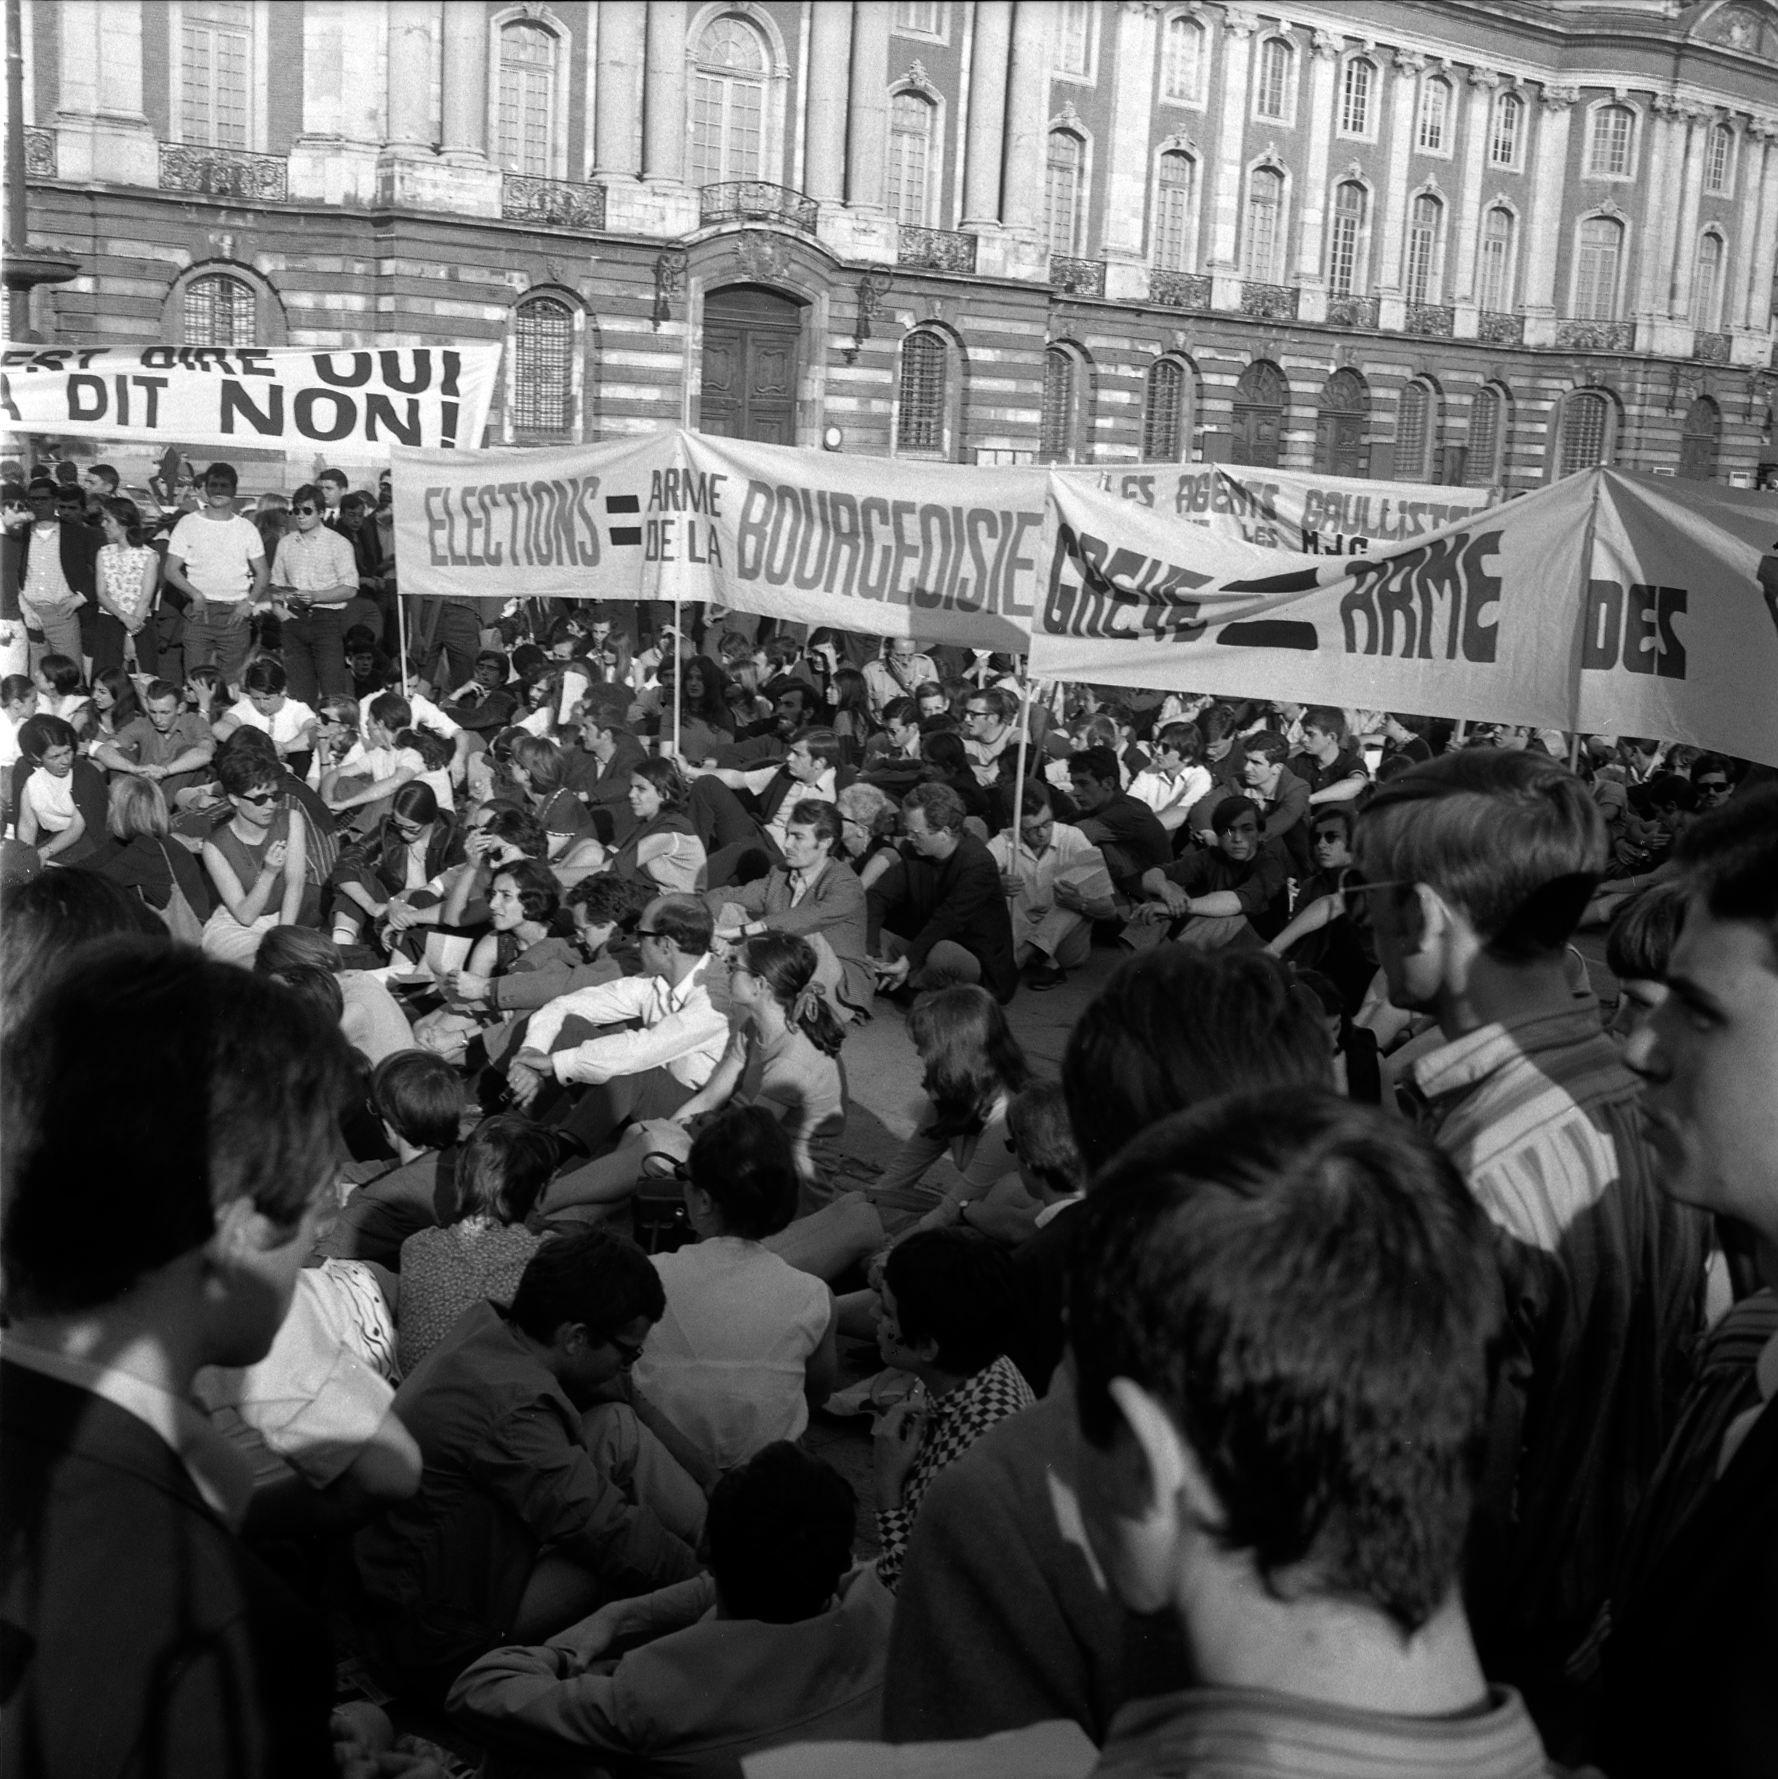 11 12.06.68 mai 68. nuit d e meutes. manif. barricades.de ga ts  1968    53fi1037 fr3aqu